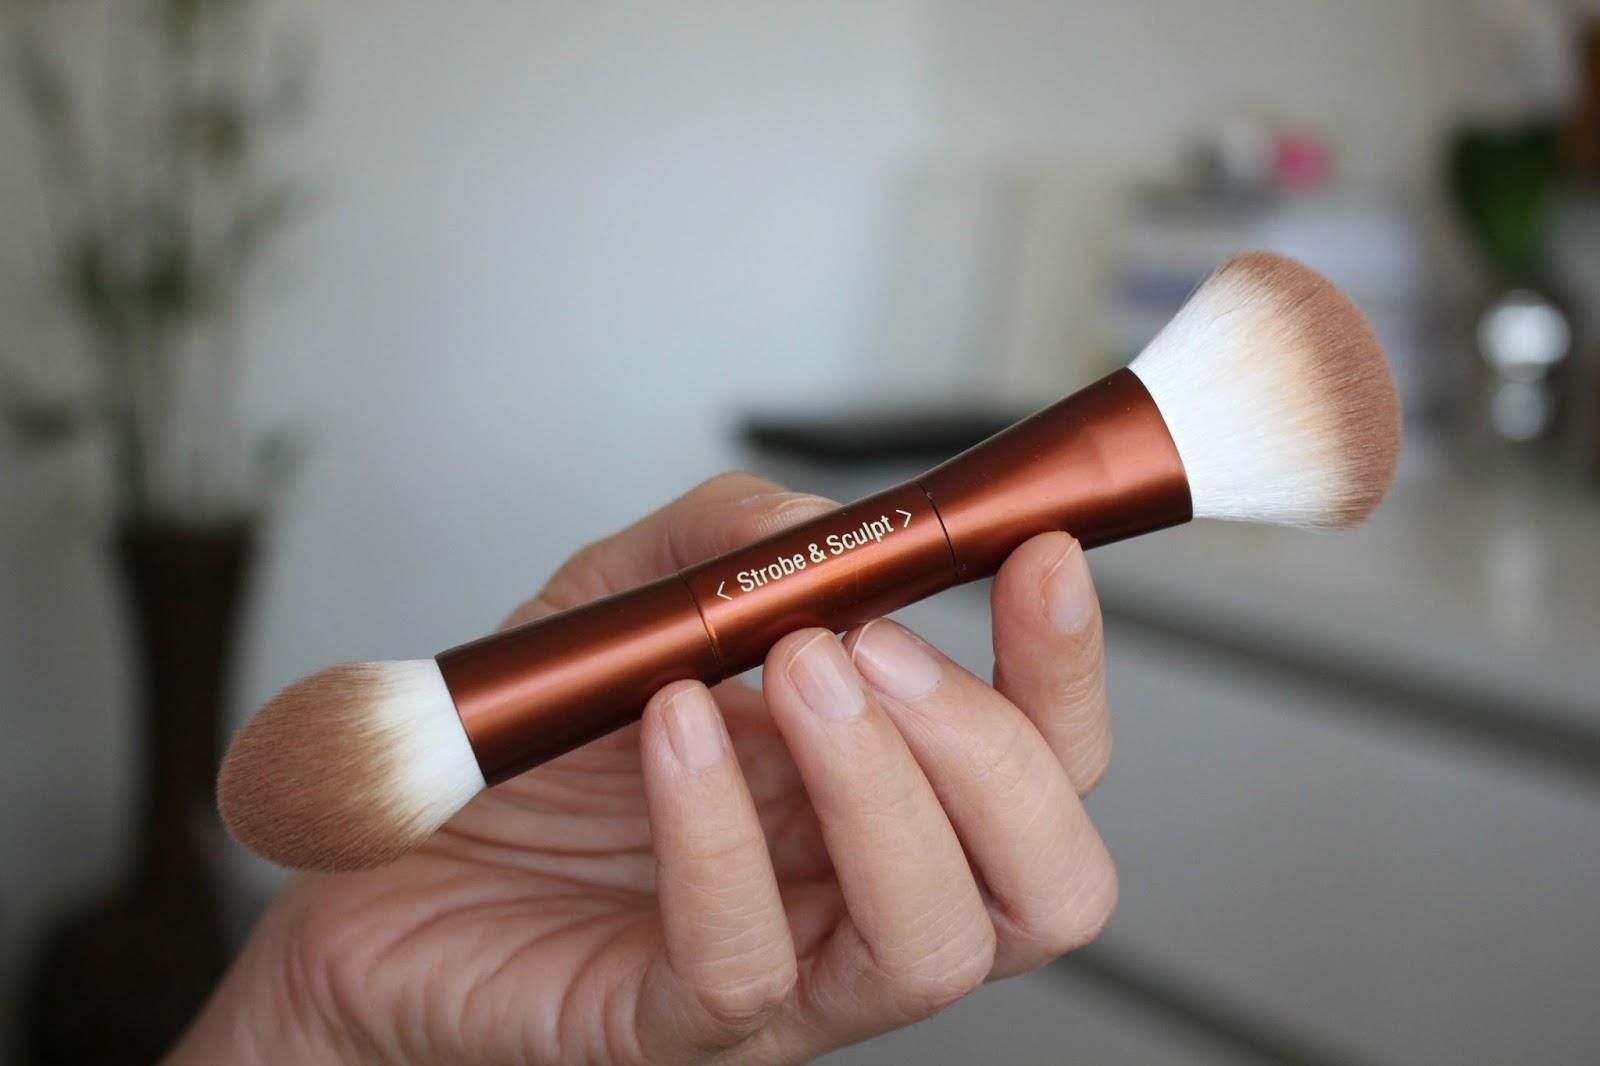 Pixi Beauty Maryam Maquillage Strobe & Bronze Glow & Bronze Palette & Strobe & Sculpt Highlight & Contour Palette